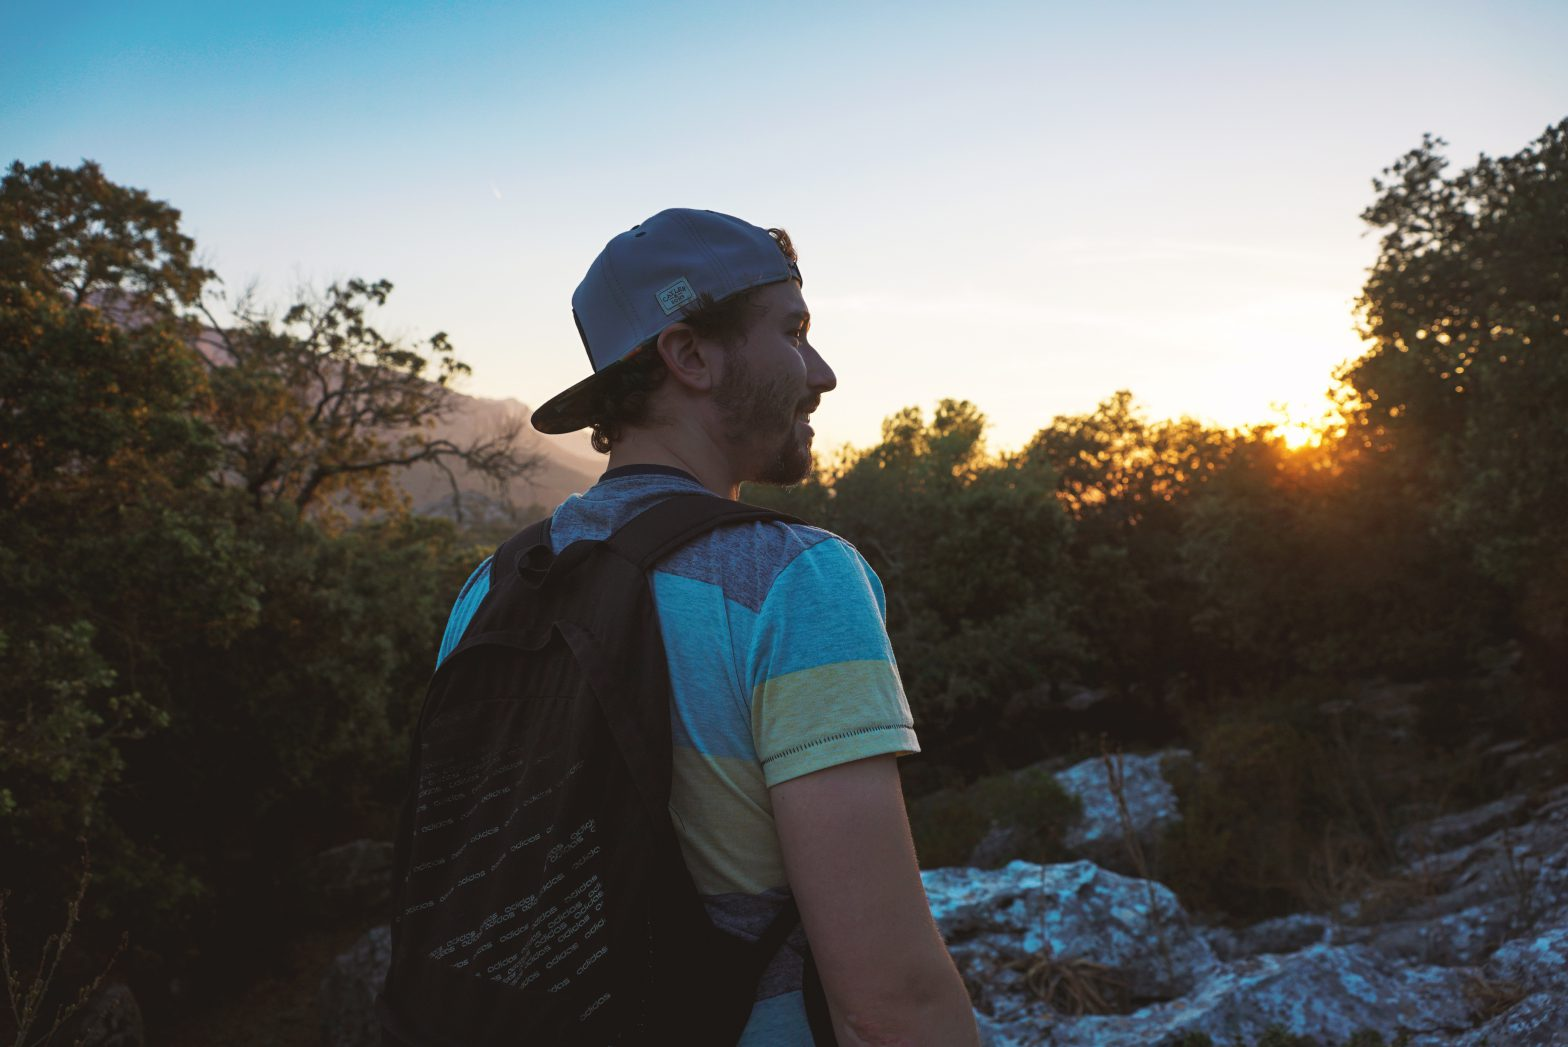 Philip im Sonnenuntergang